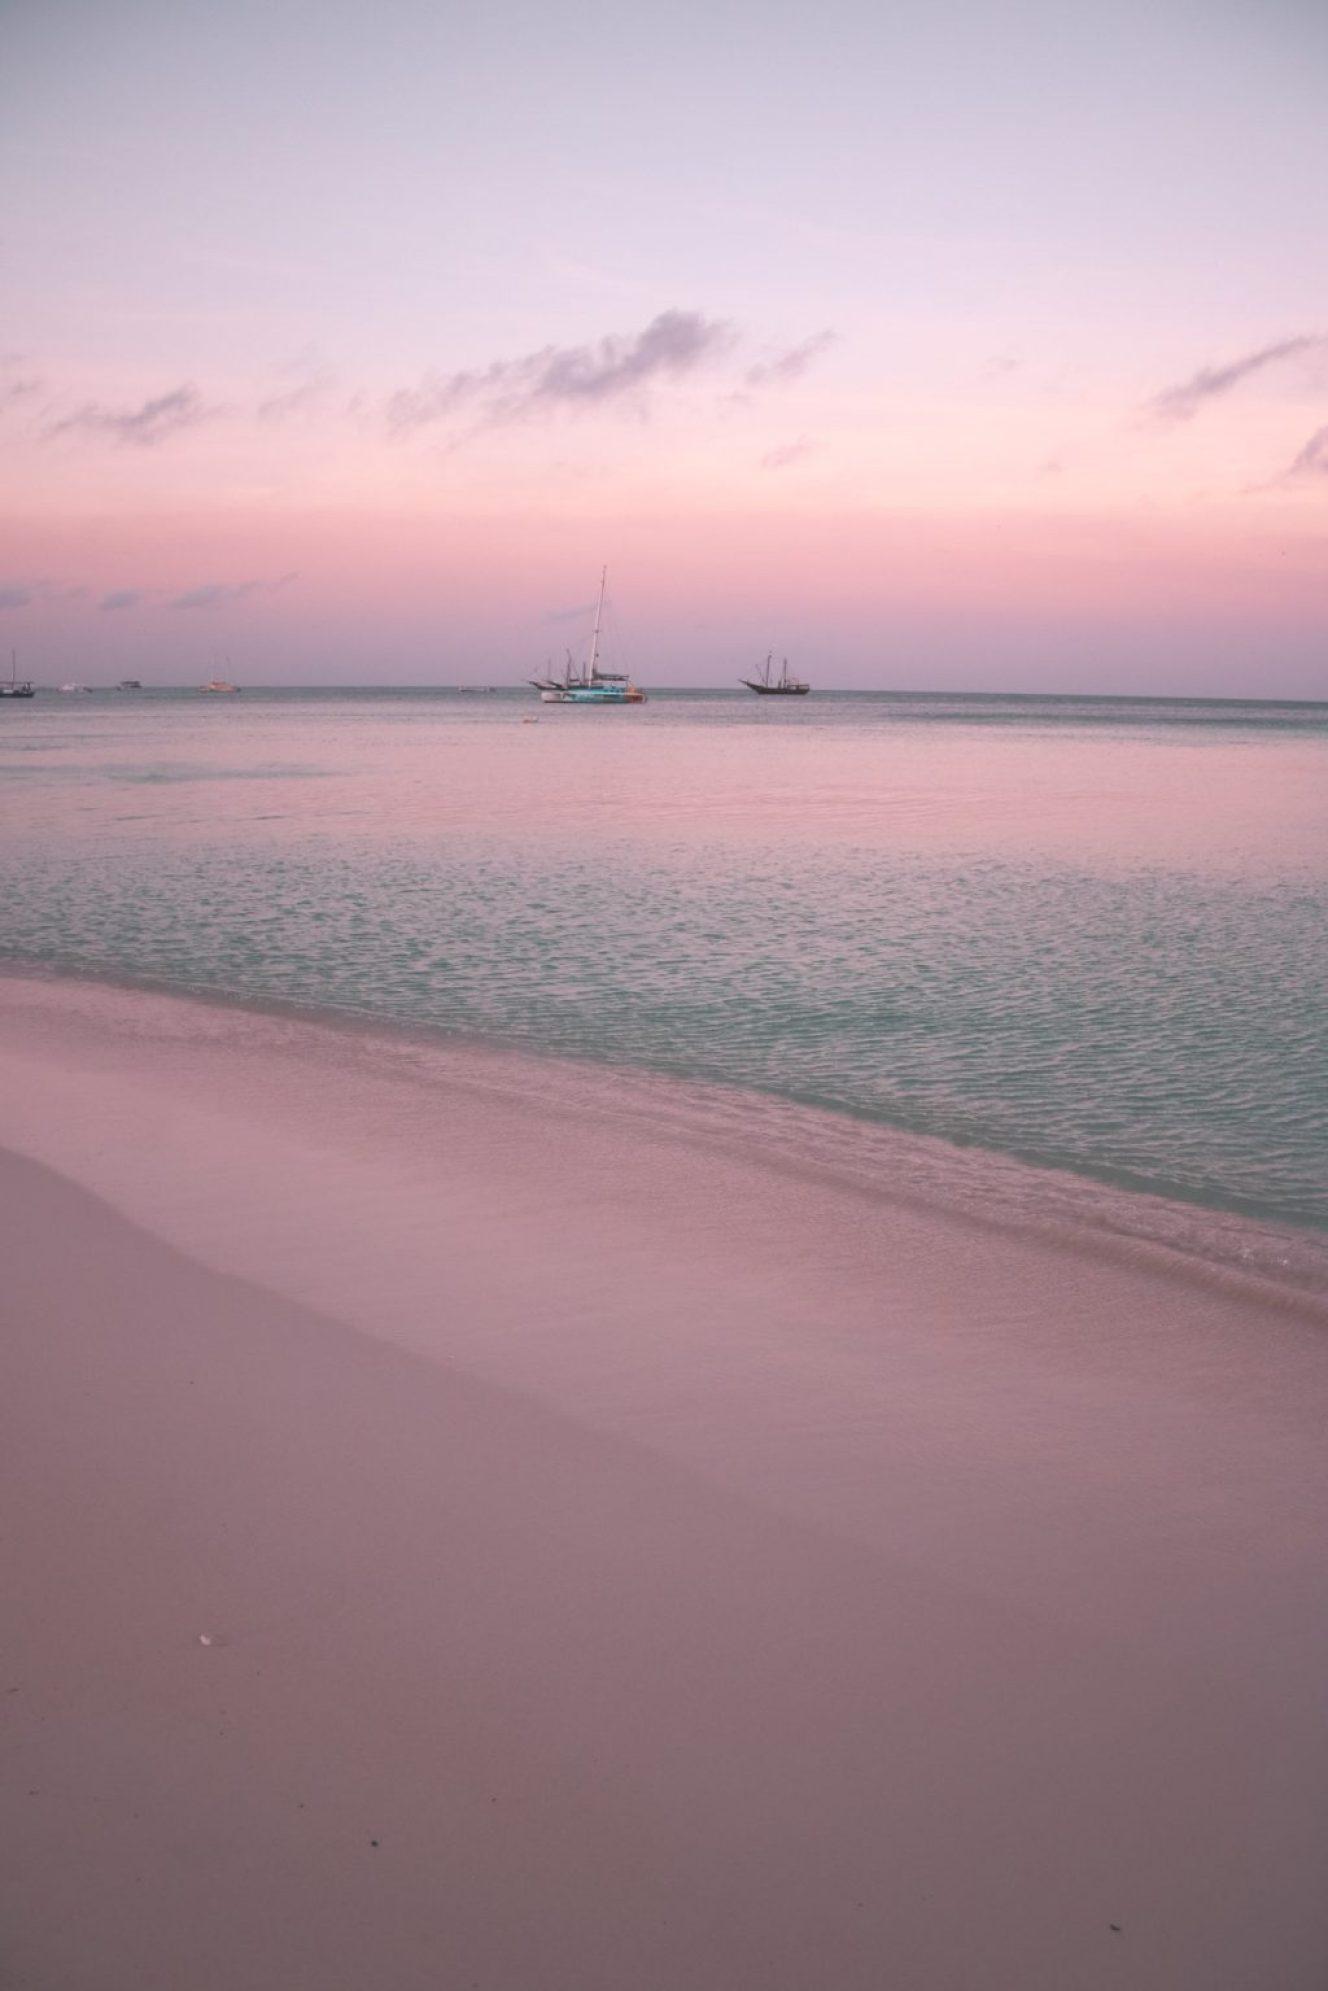 where to stay in aruba - ritz carlton - best sunset views